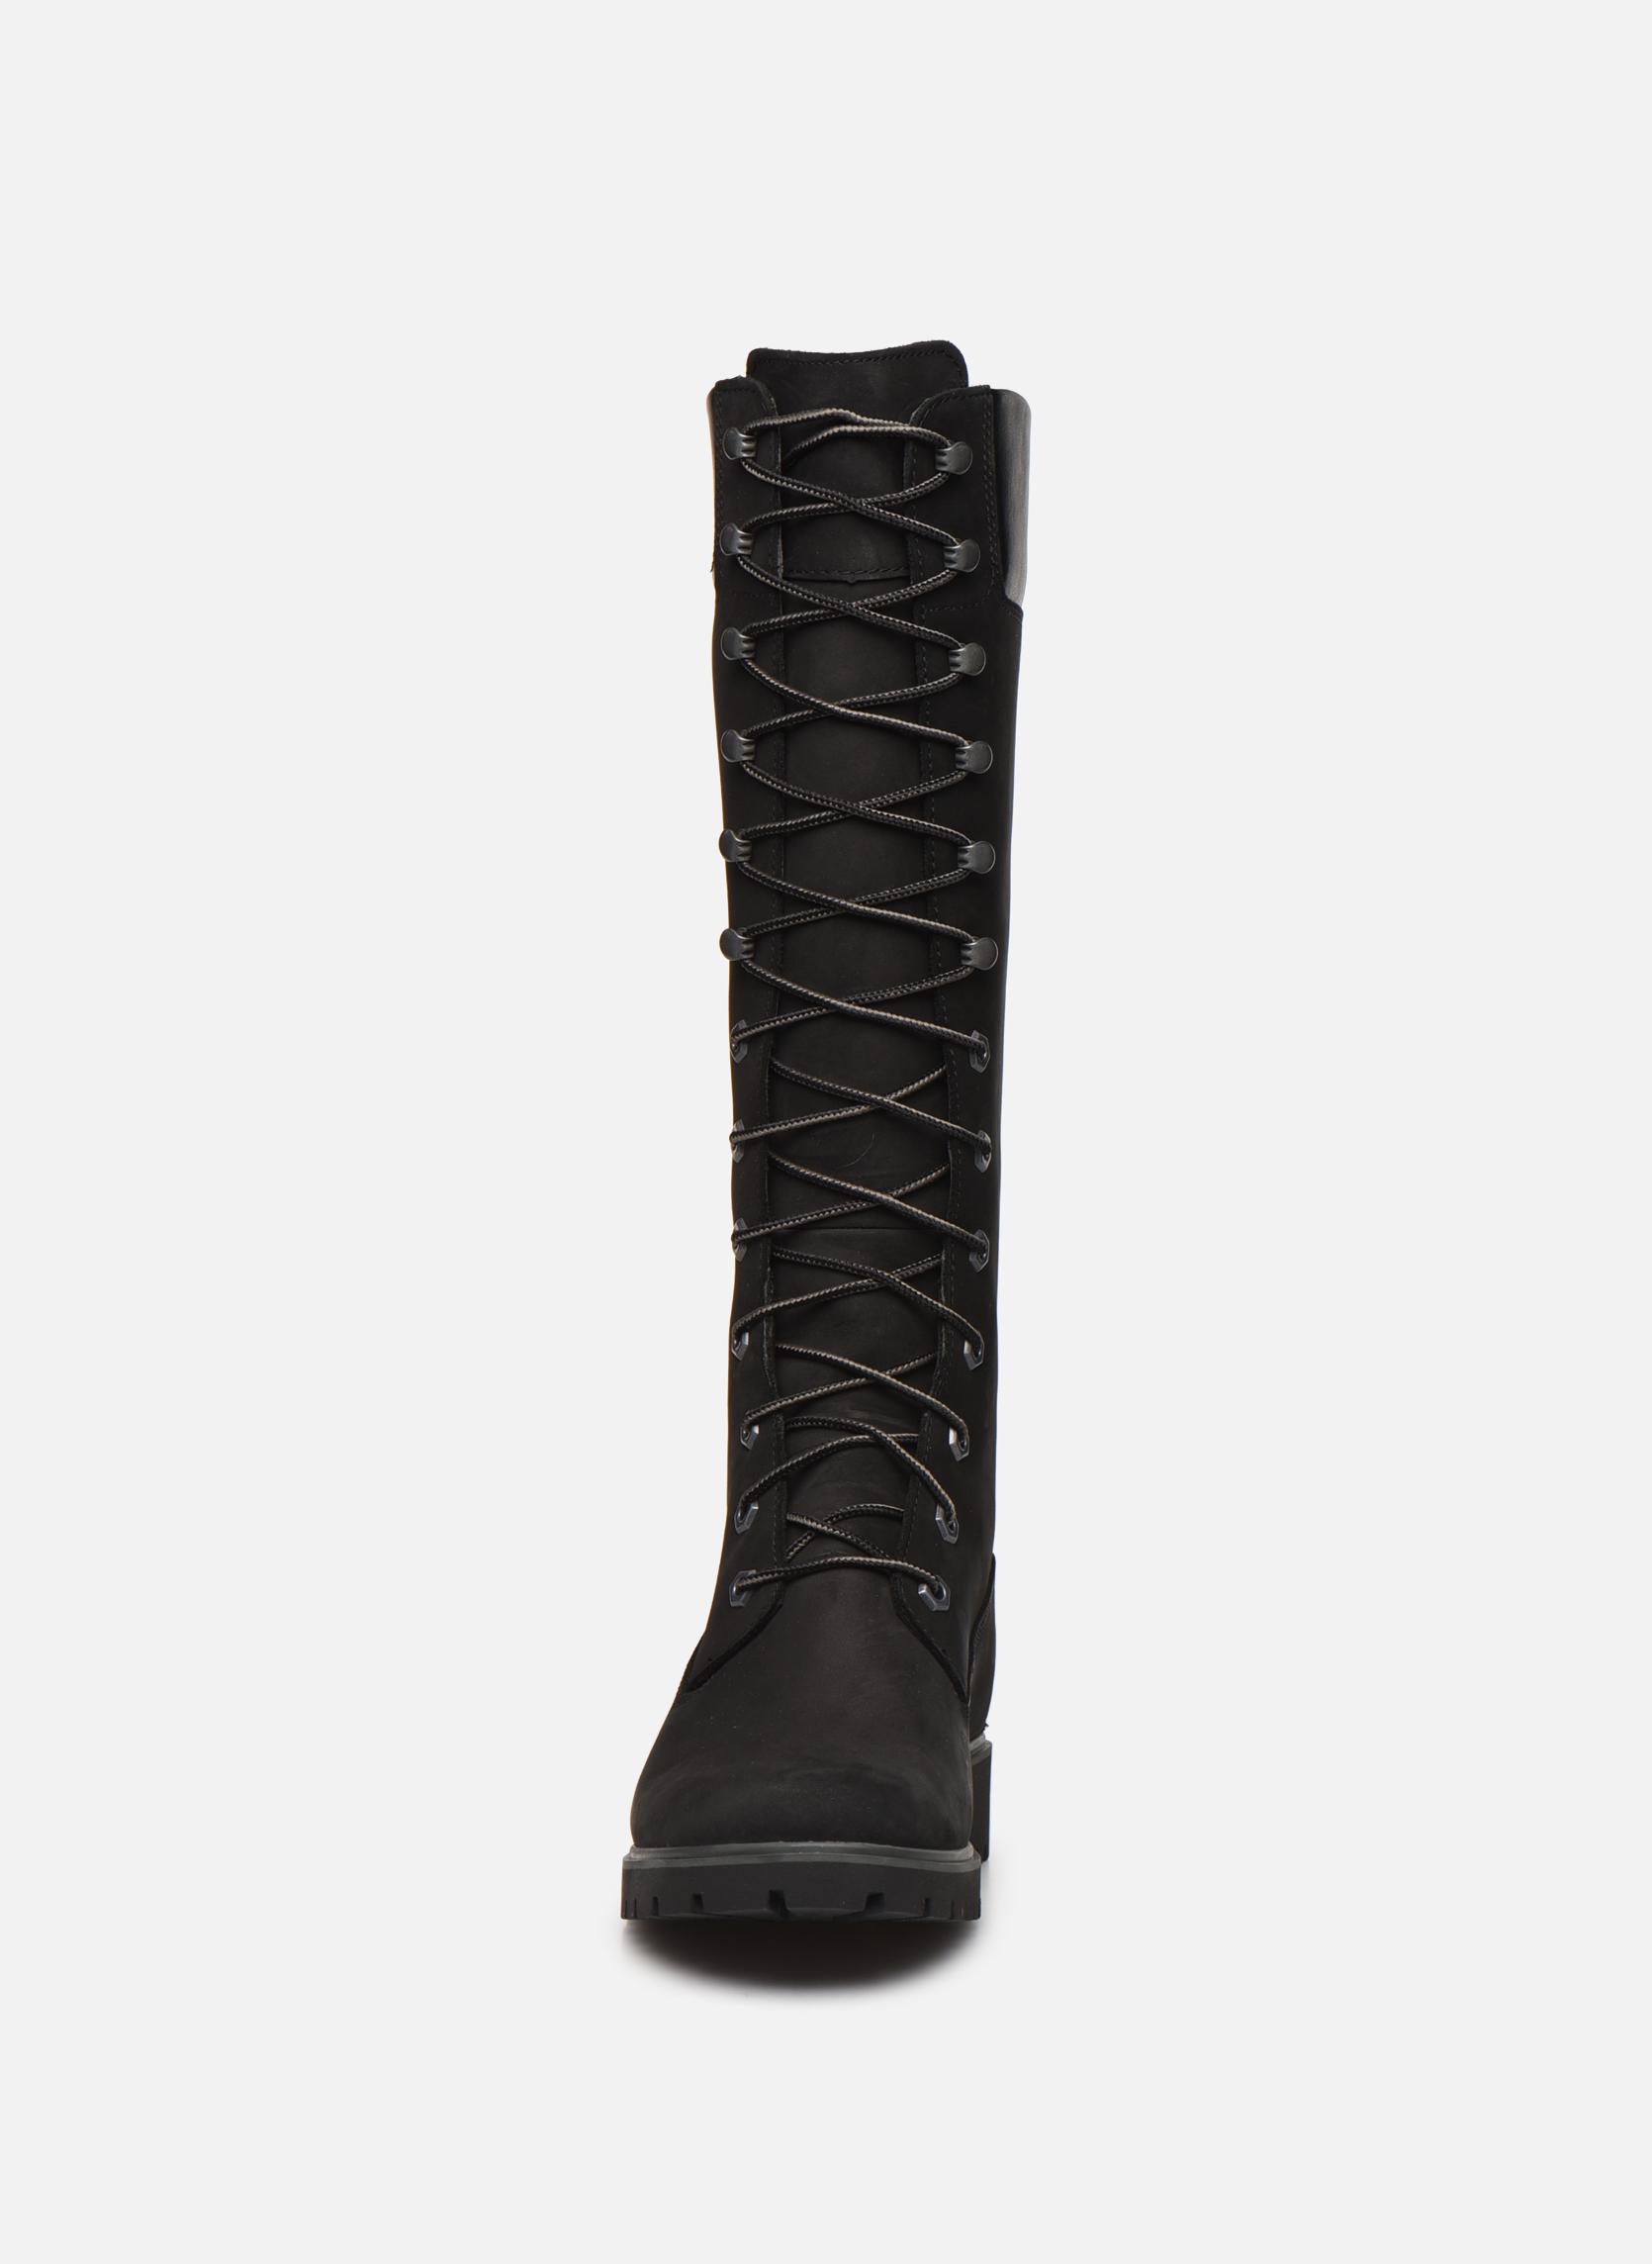 Women's Premium 14 inch Black Nubuck